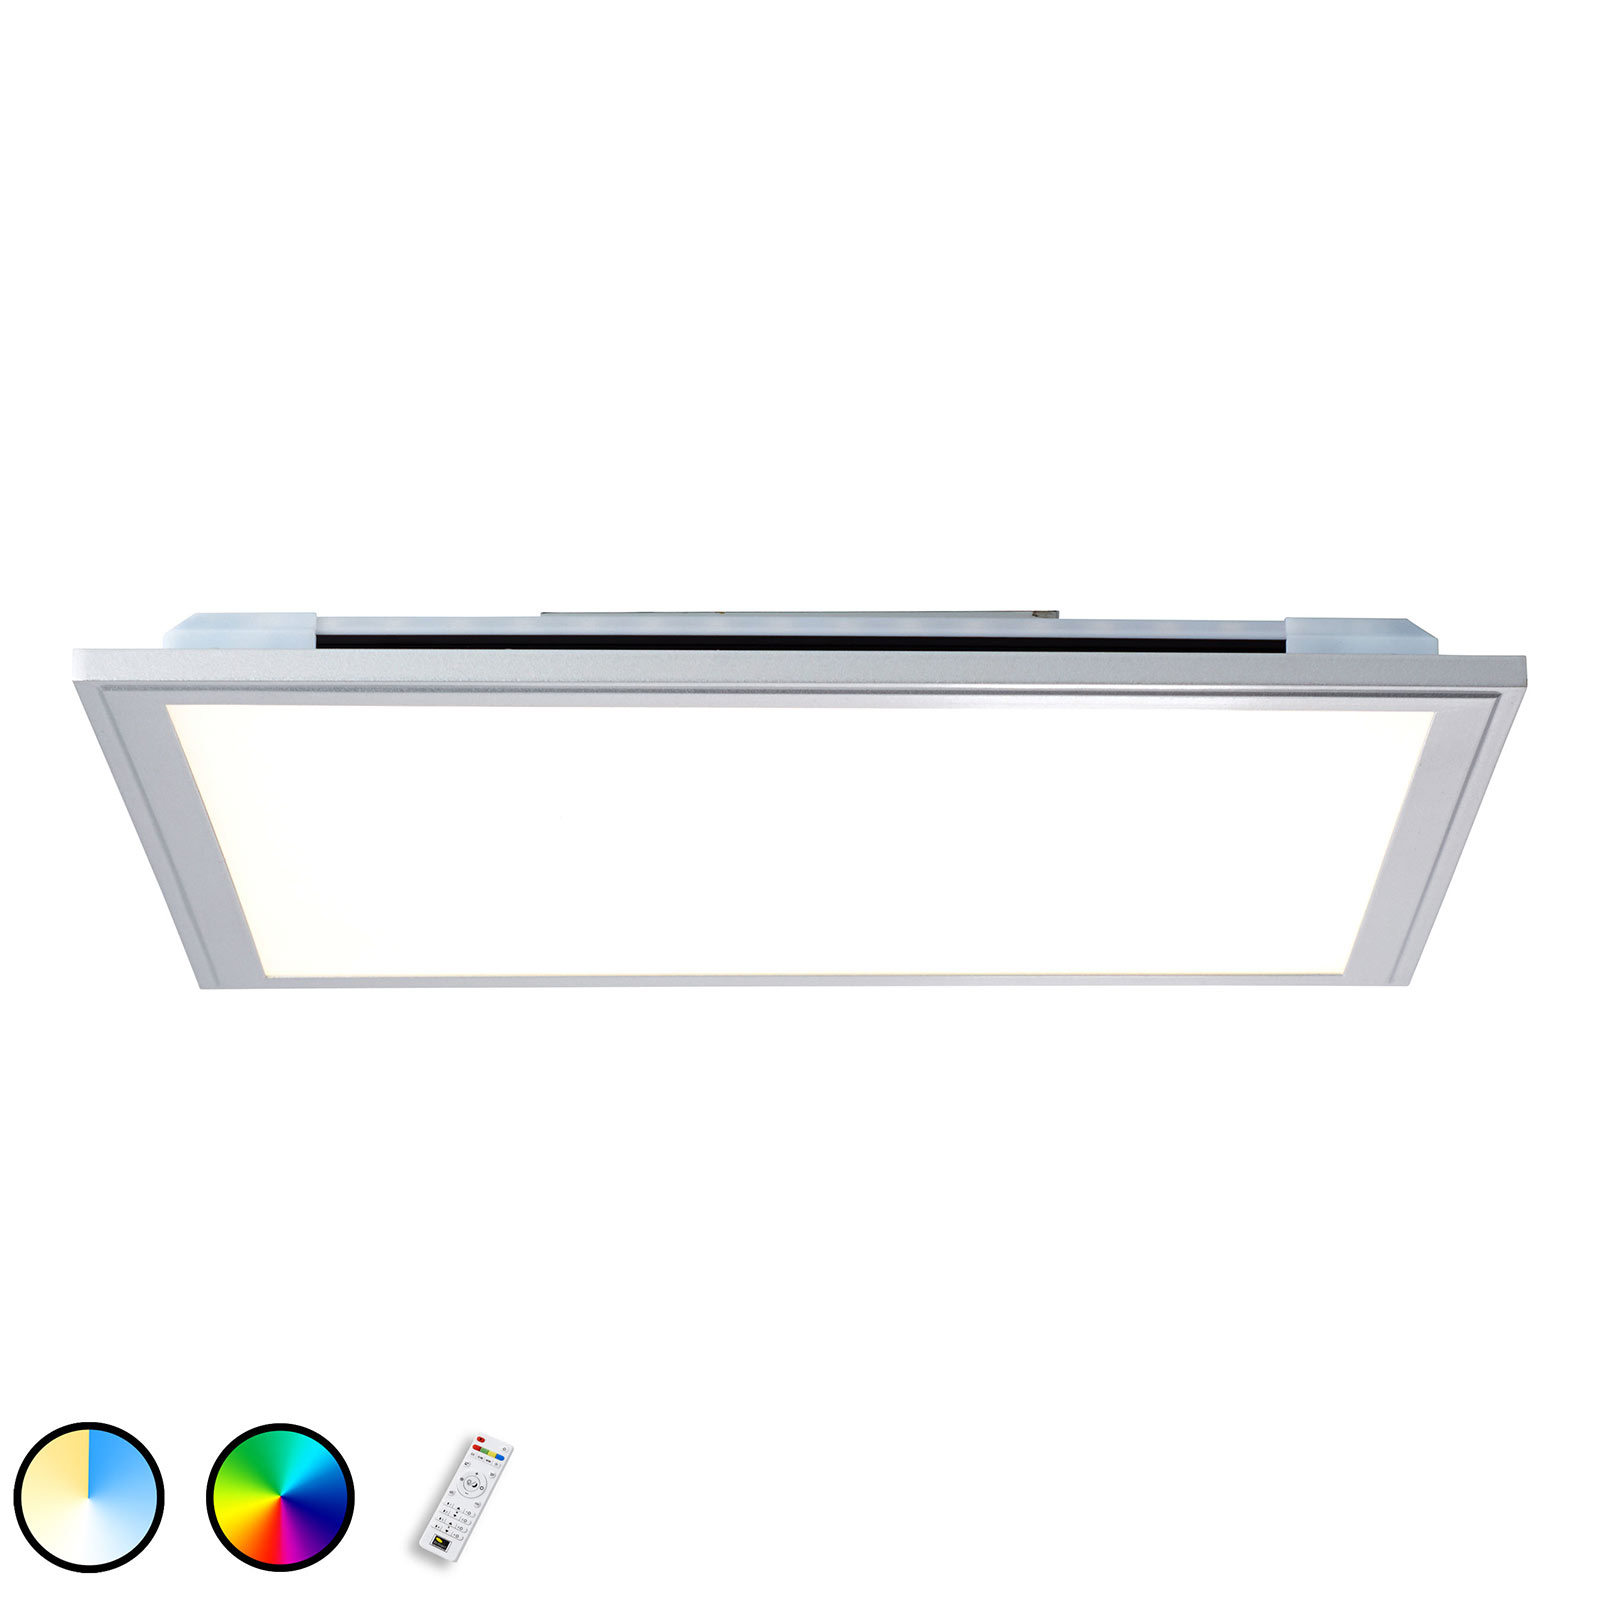 LED-taklampe Alissa, 59,5x59,5 cm